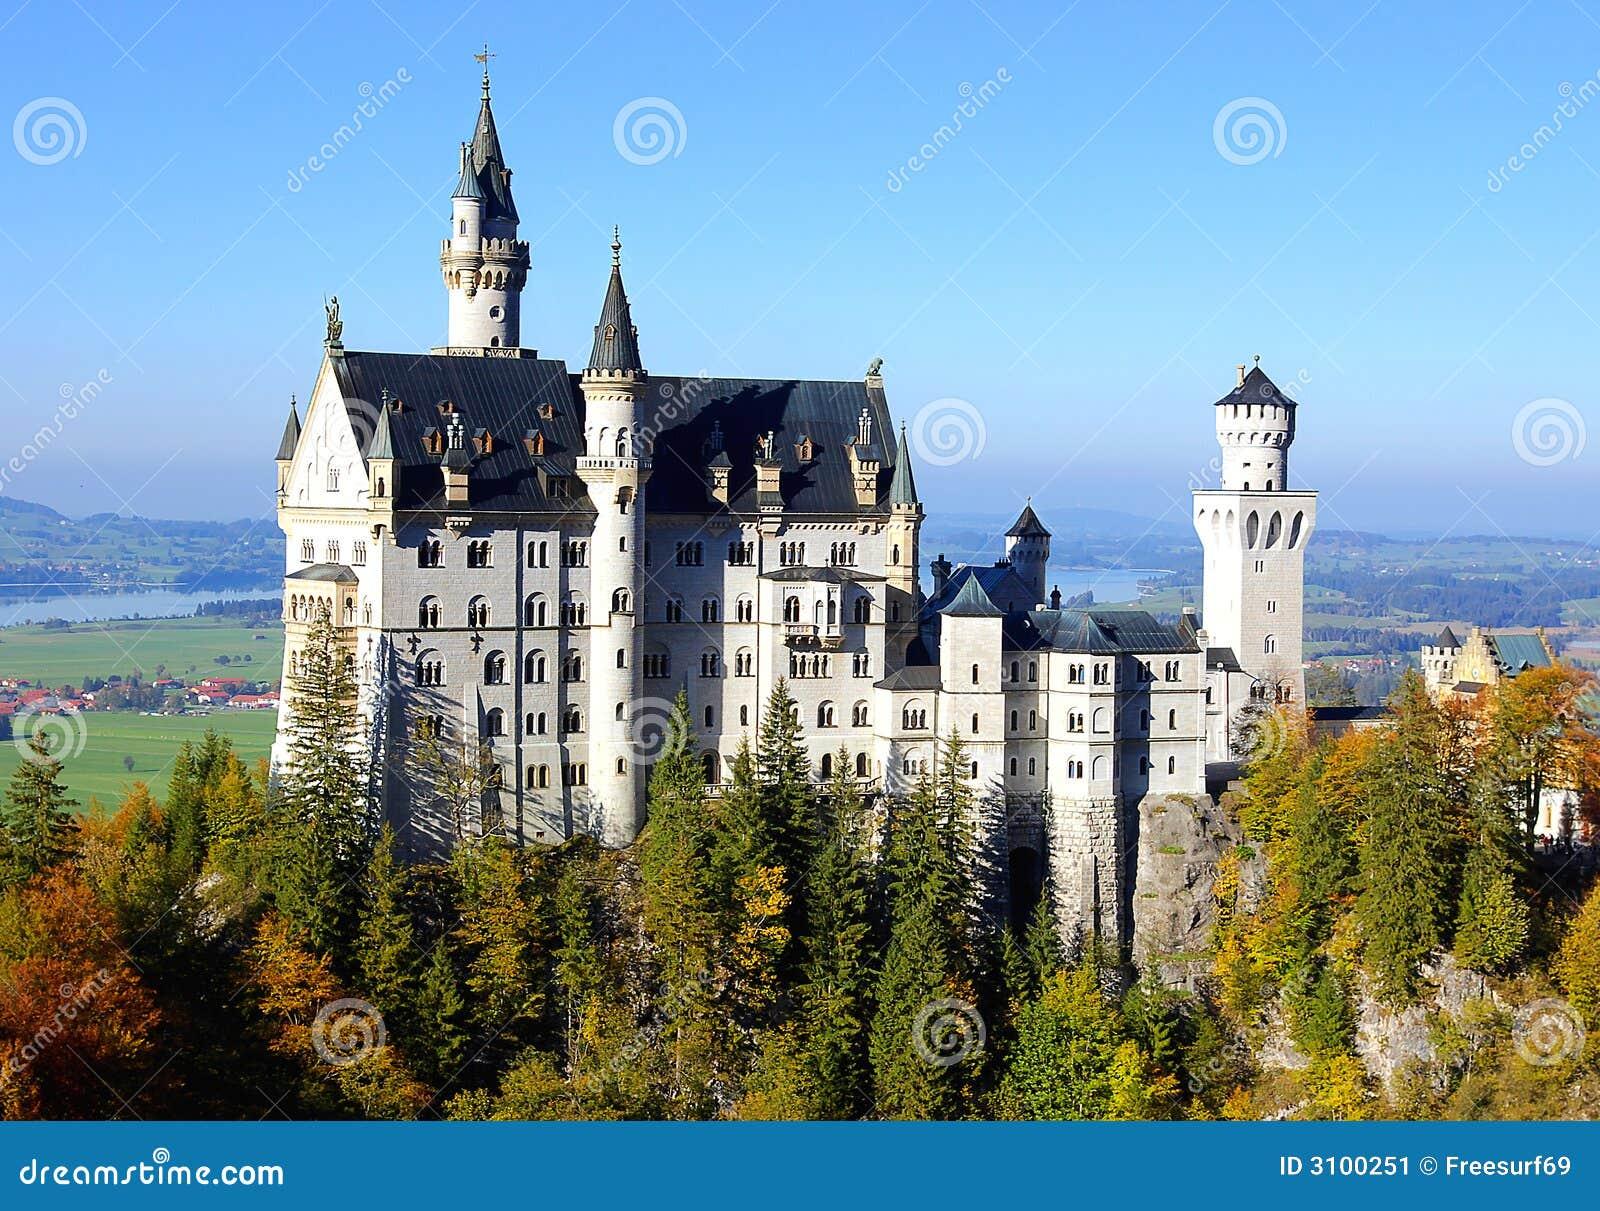 Schloss Neuschwanstein Geschichte